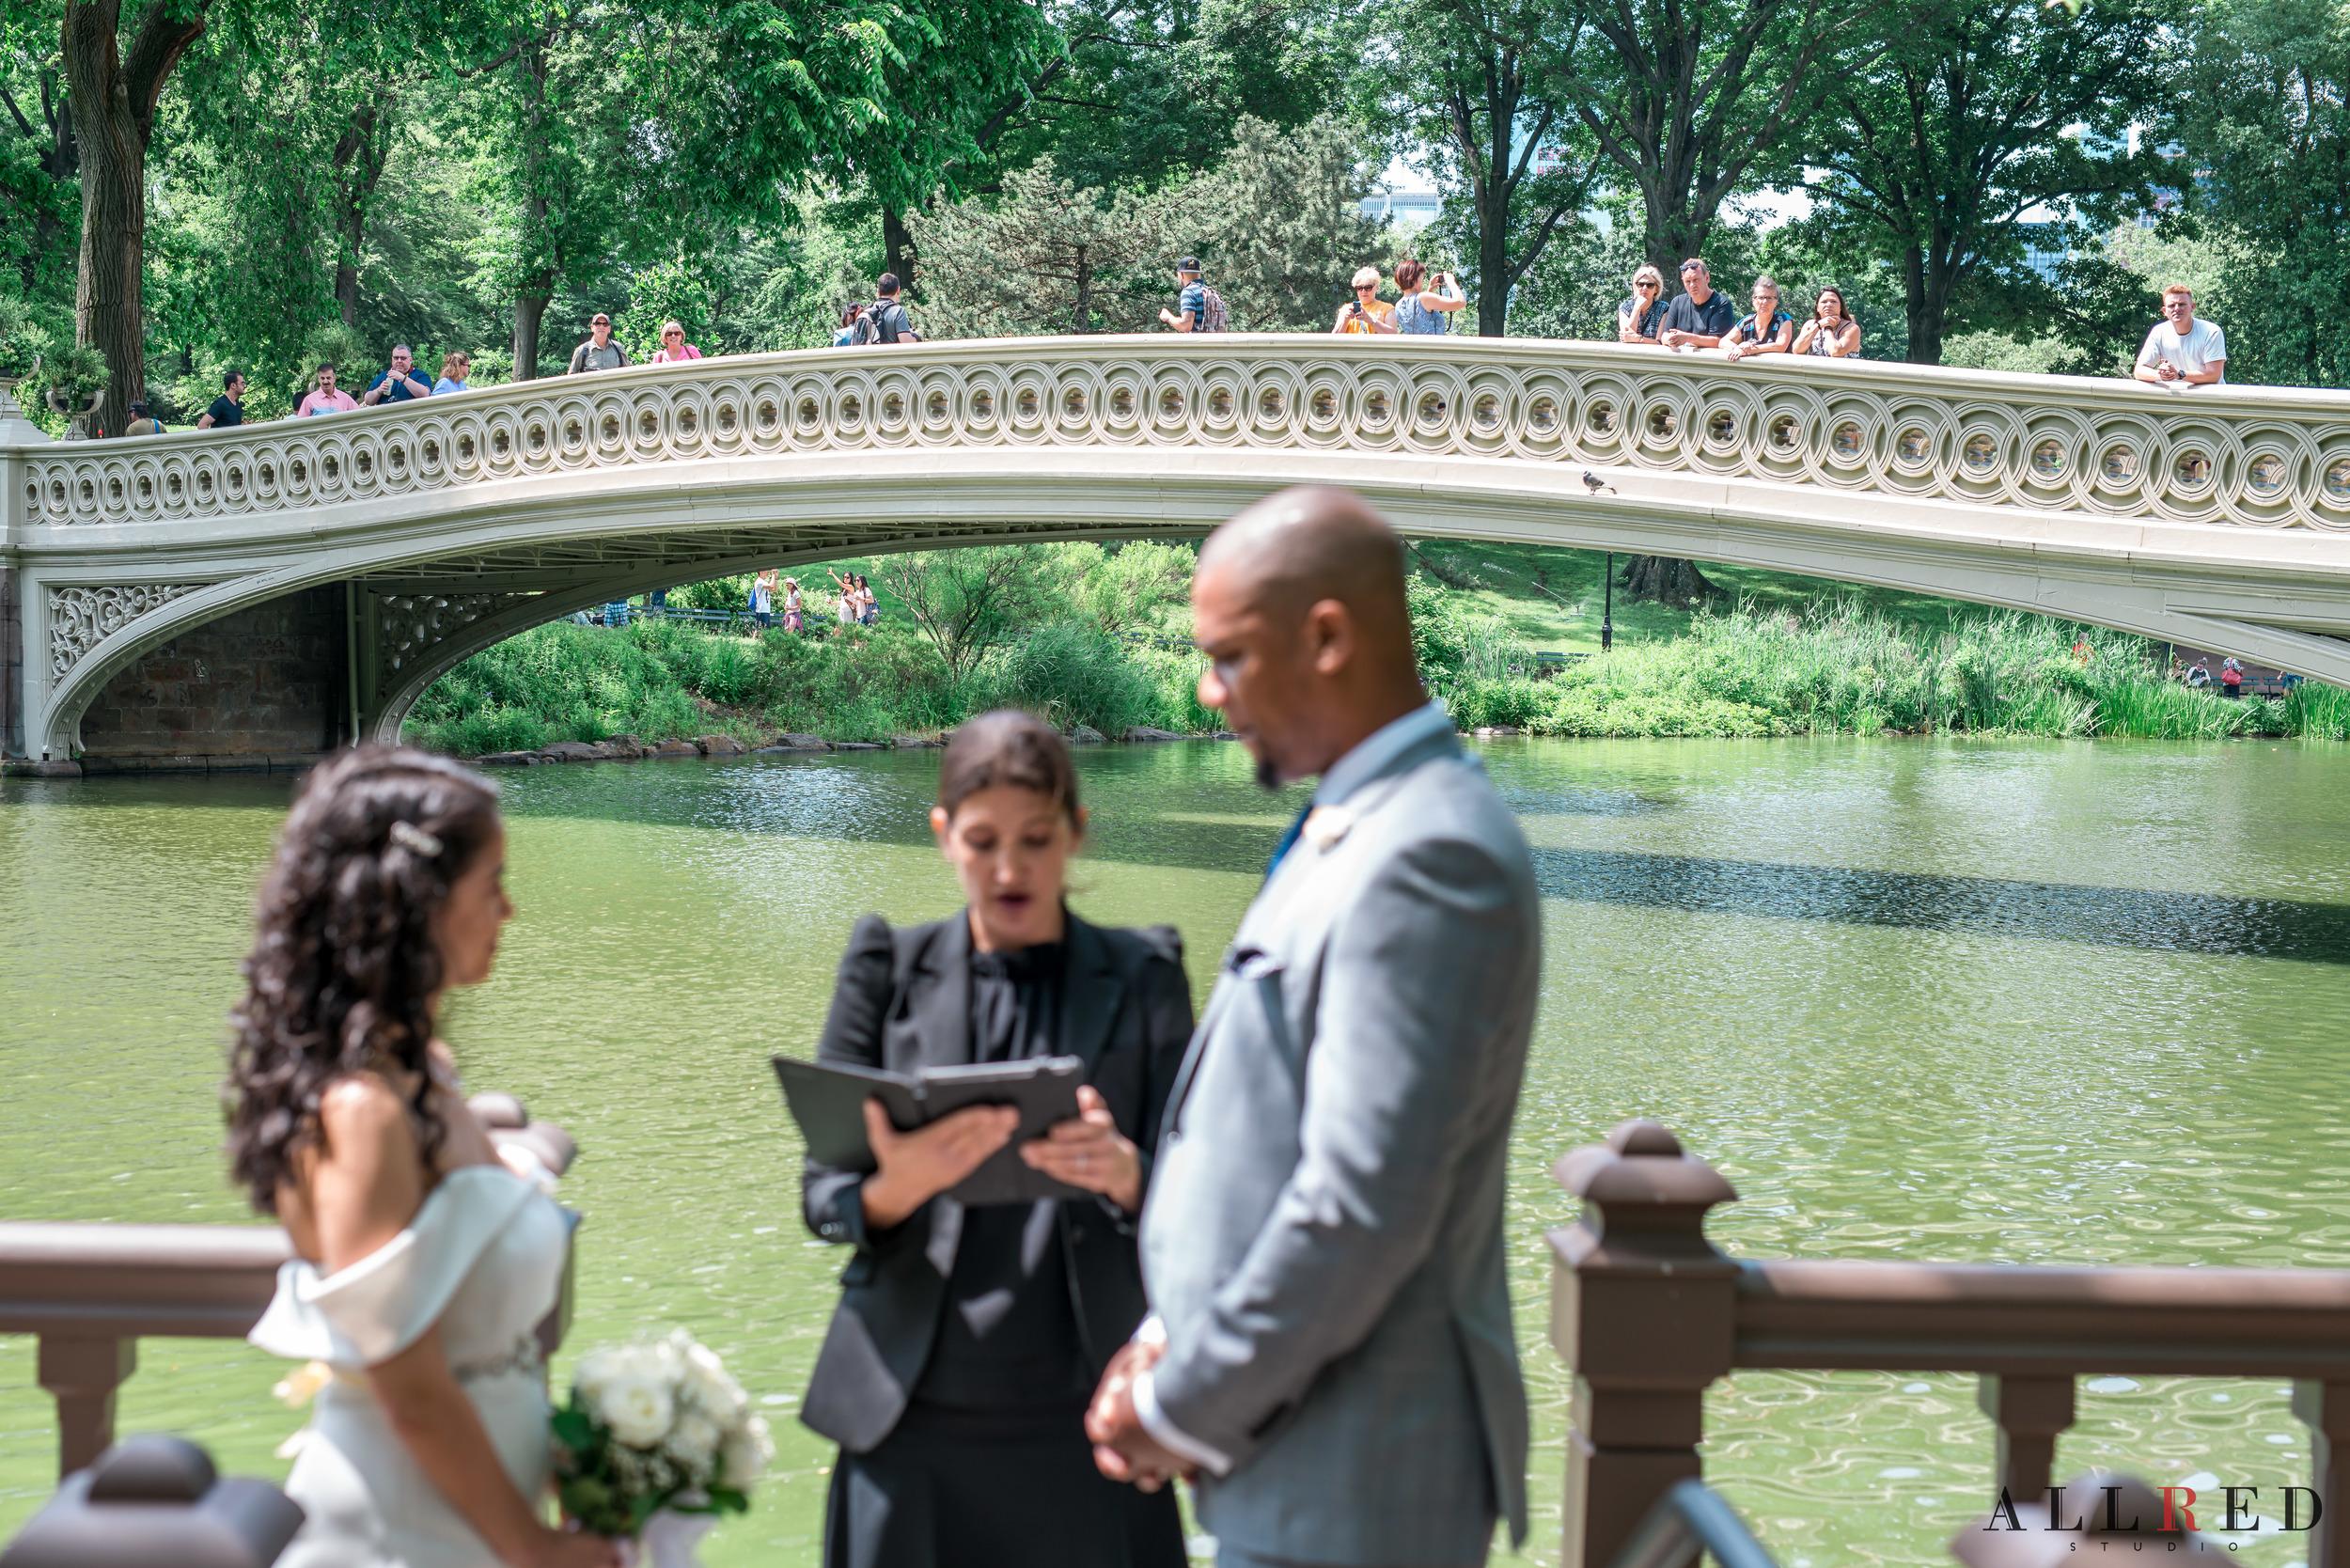 Wedding-central-park-allred-studio-new-york-photographer-new-jersey-hudson-valley-2134.jpg